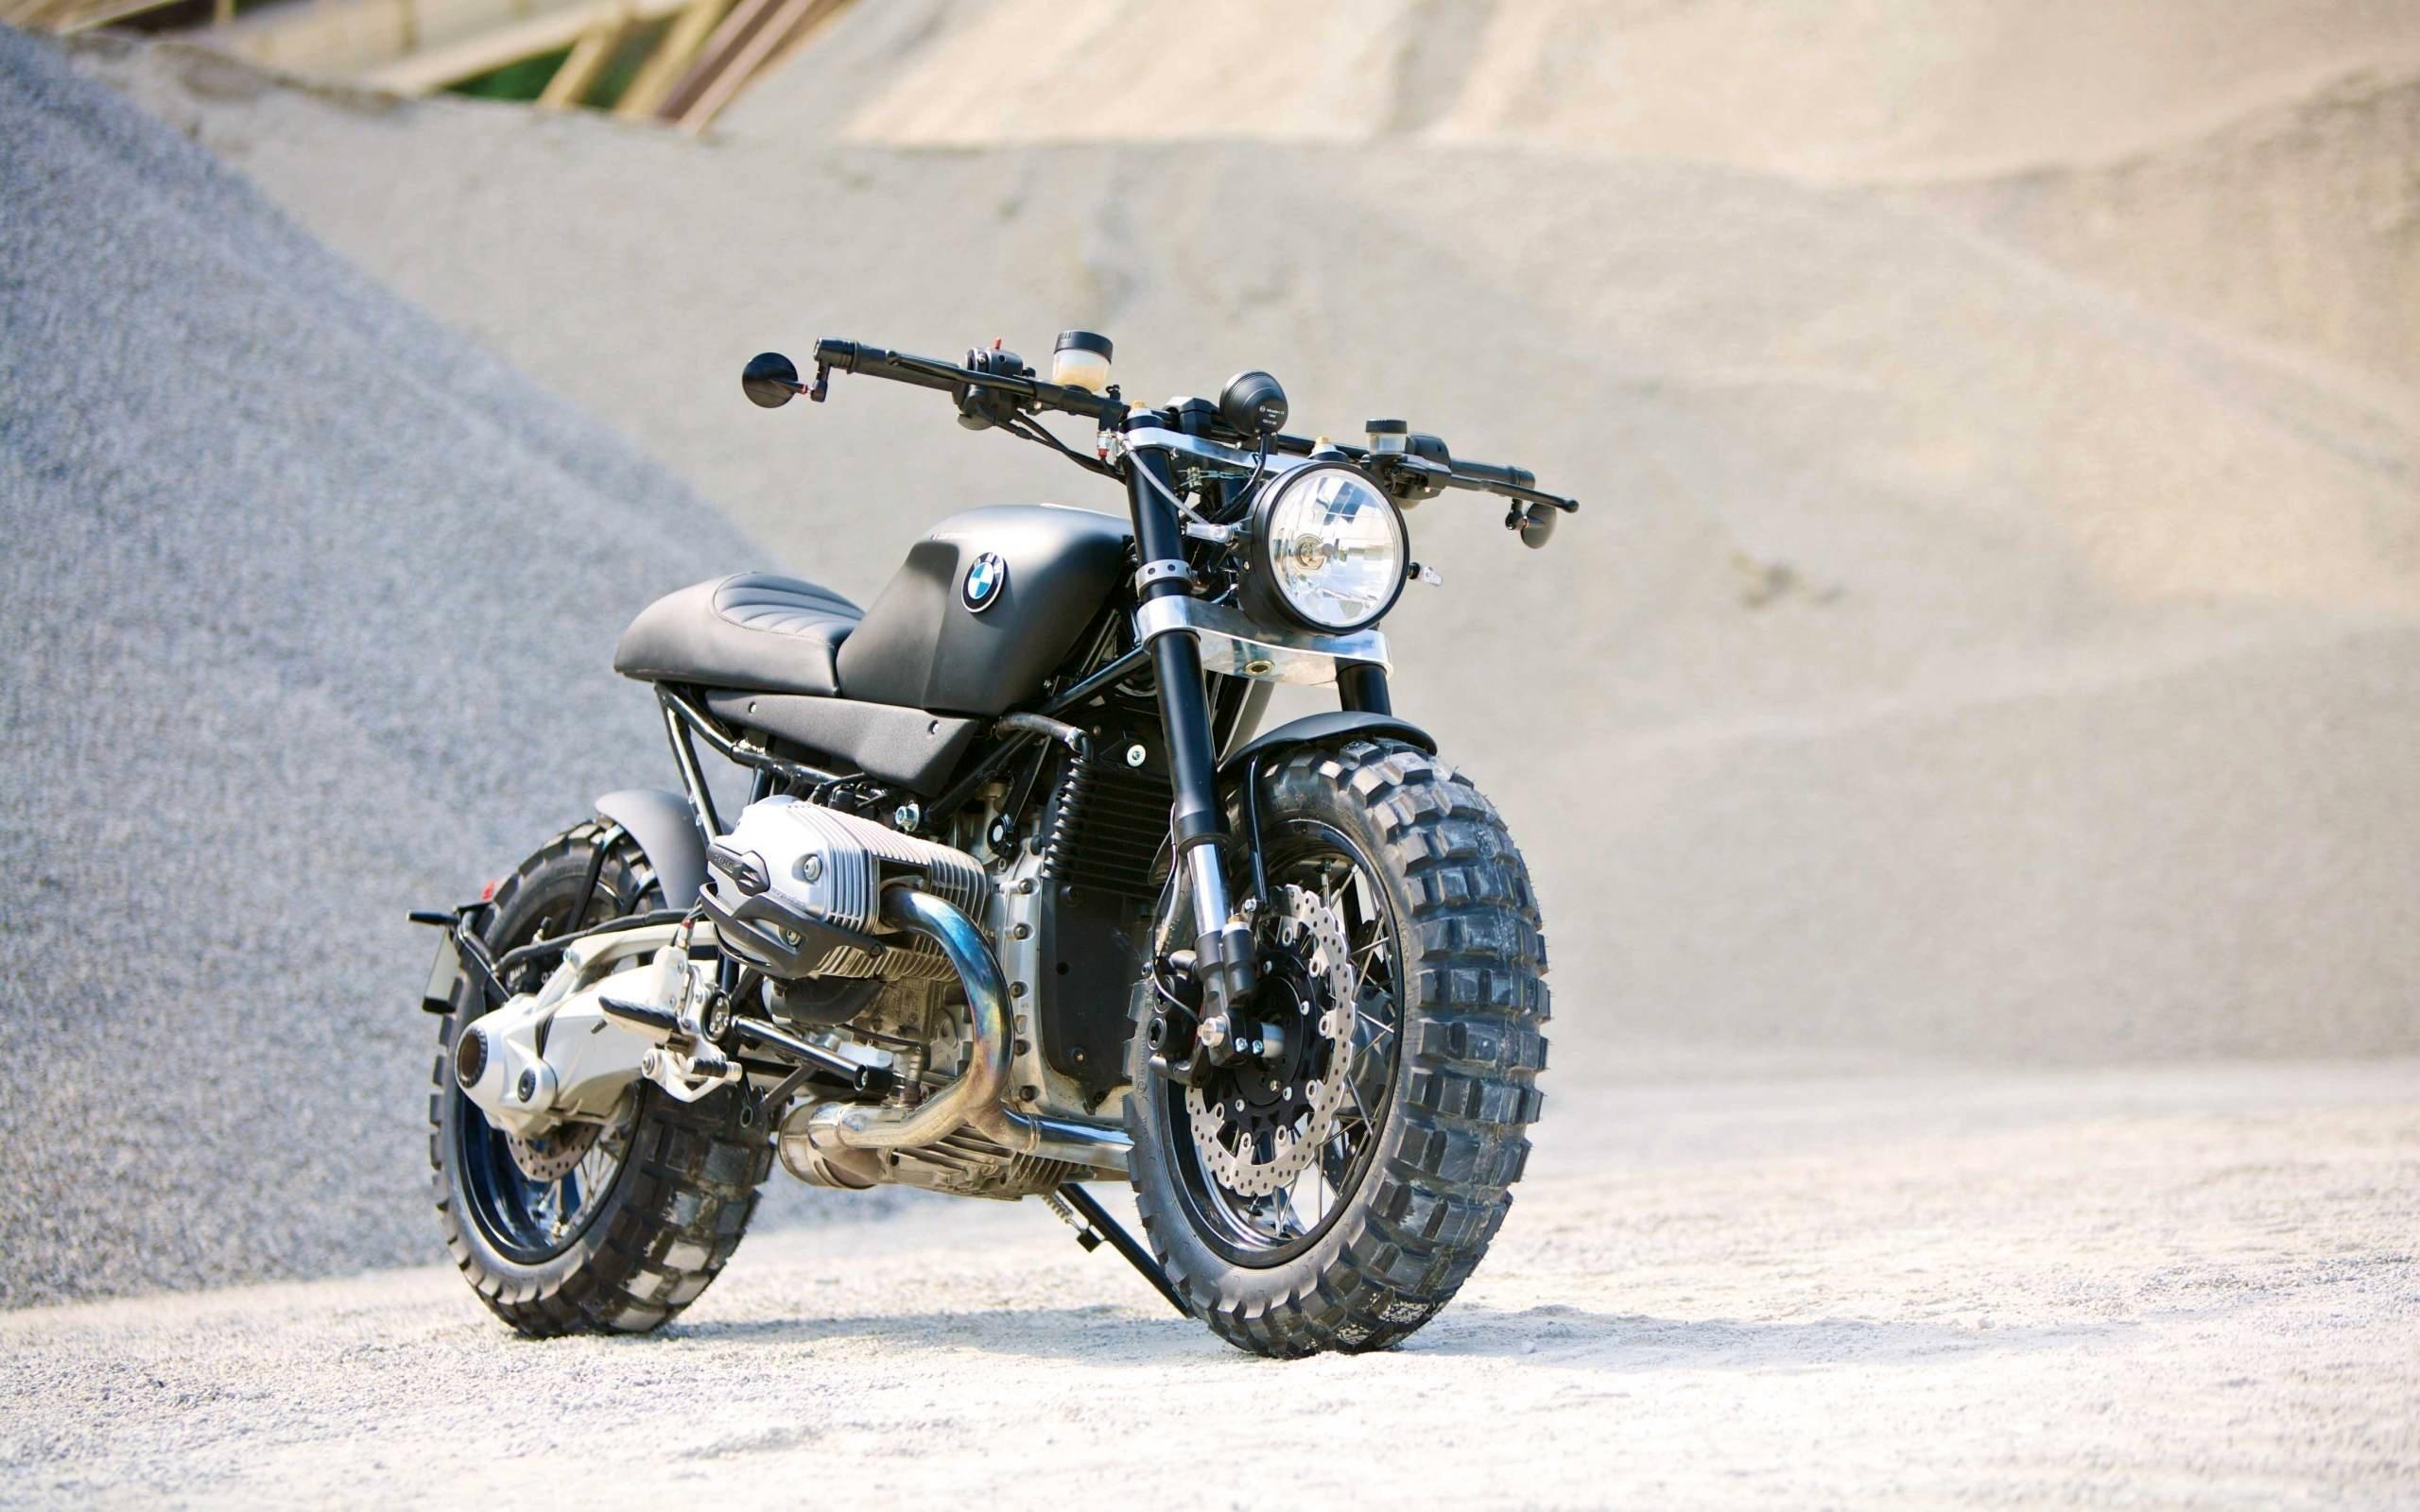 bmw-r1200r scrambler, мотоцикл, байк